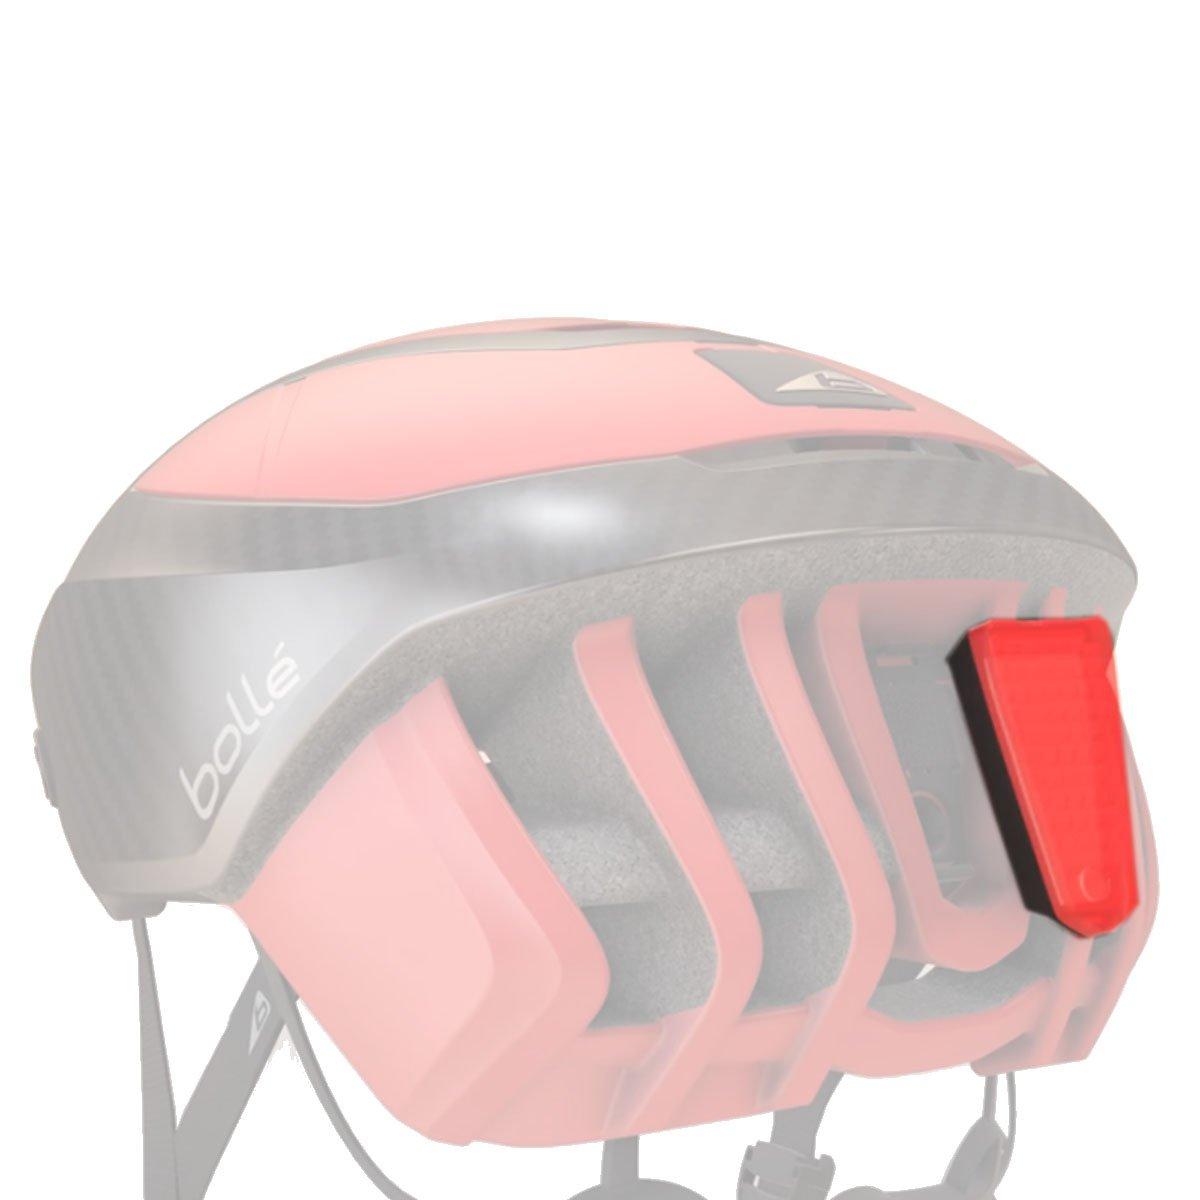 Bolle The One/Messenger LED Flasher Helmet by Bolle   B01EOQKI66